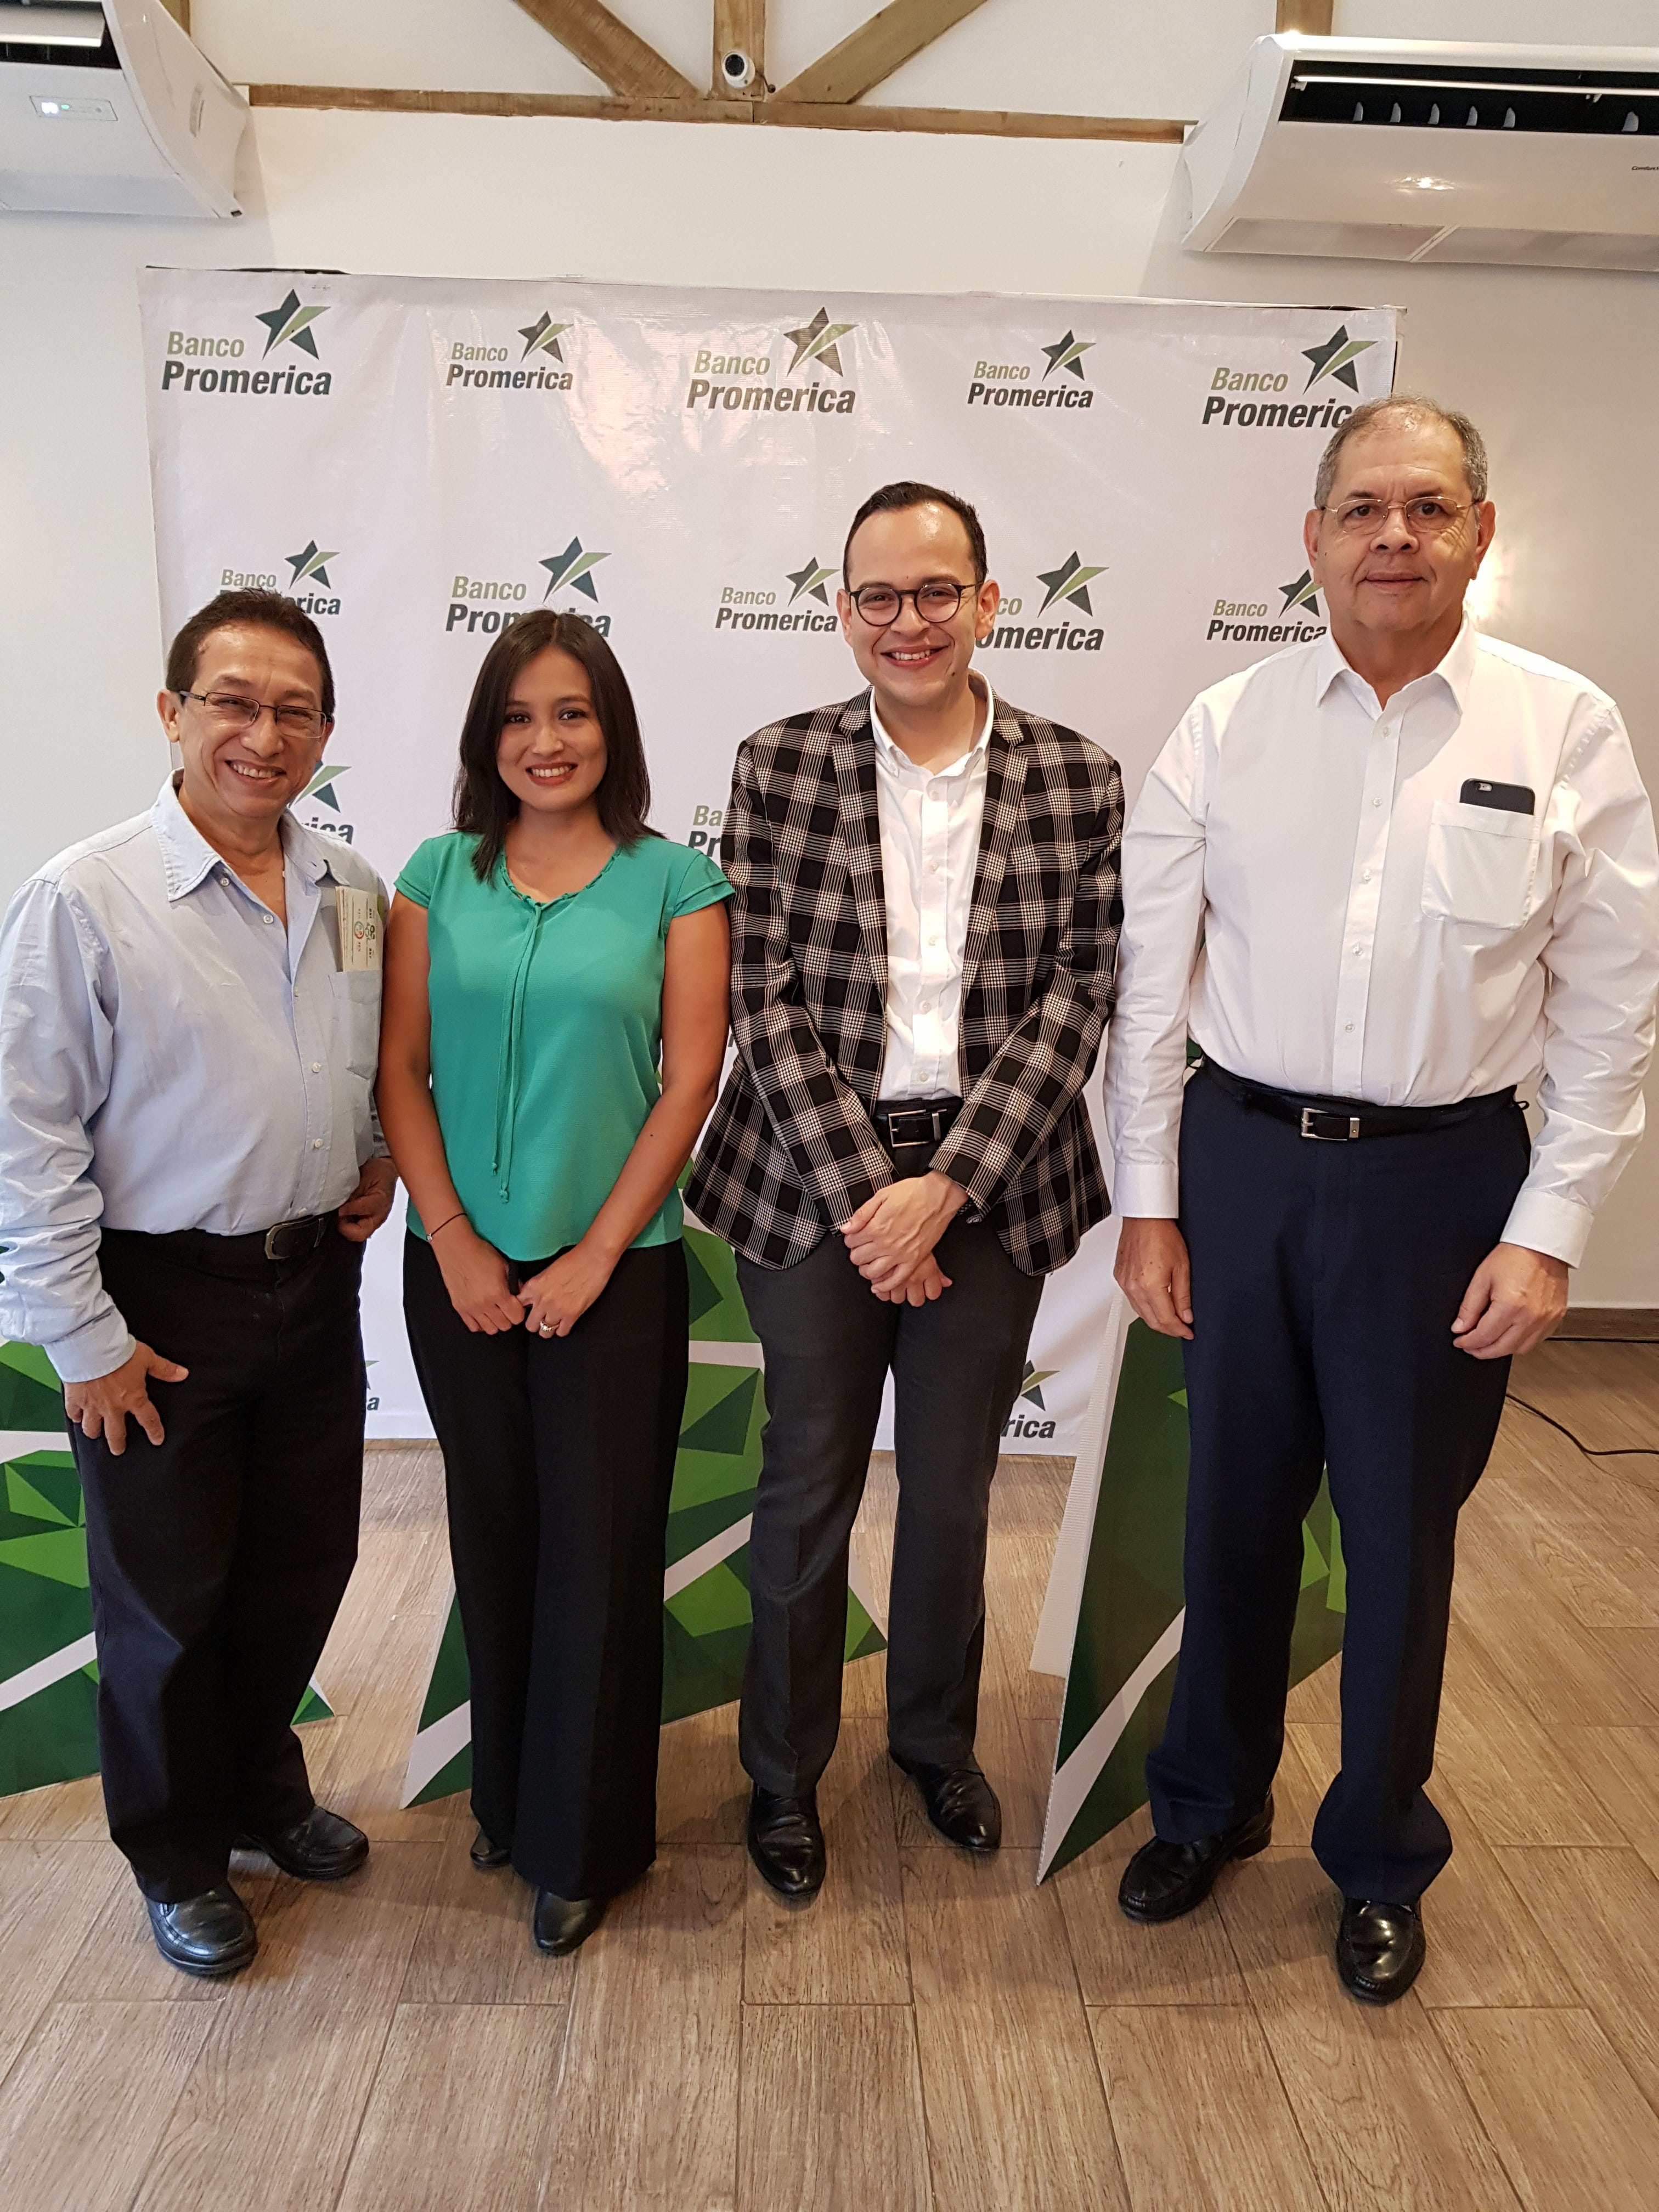 xx, Julio Gom de Fundahrse, xx, Karen Madrid de Banco Promerica, xx, J. Roberto Leiva de Fundahrse y xx.